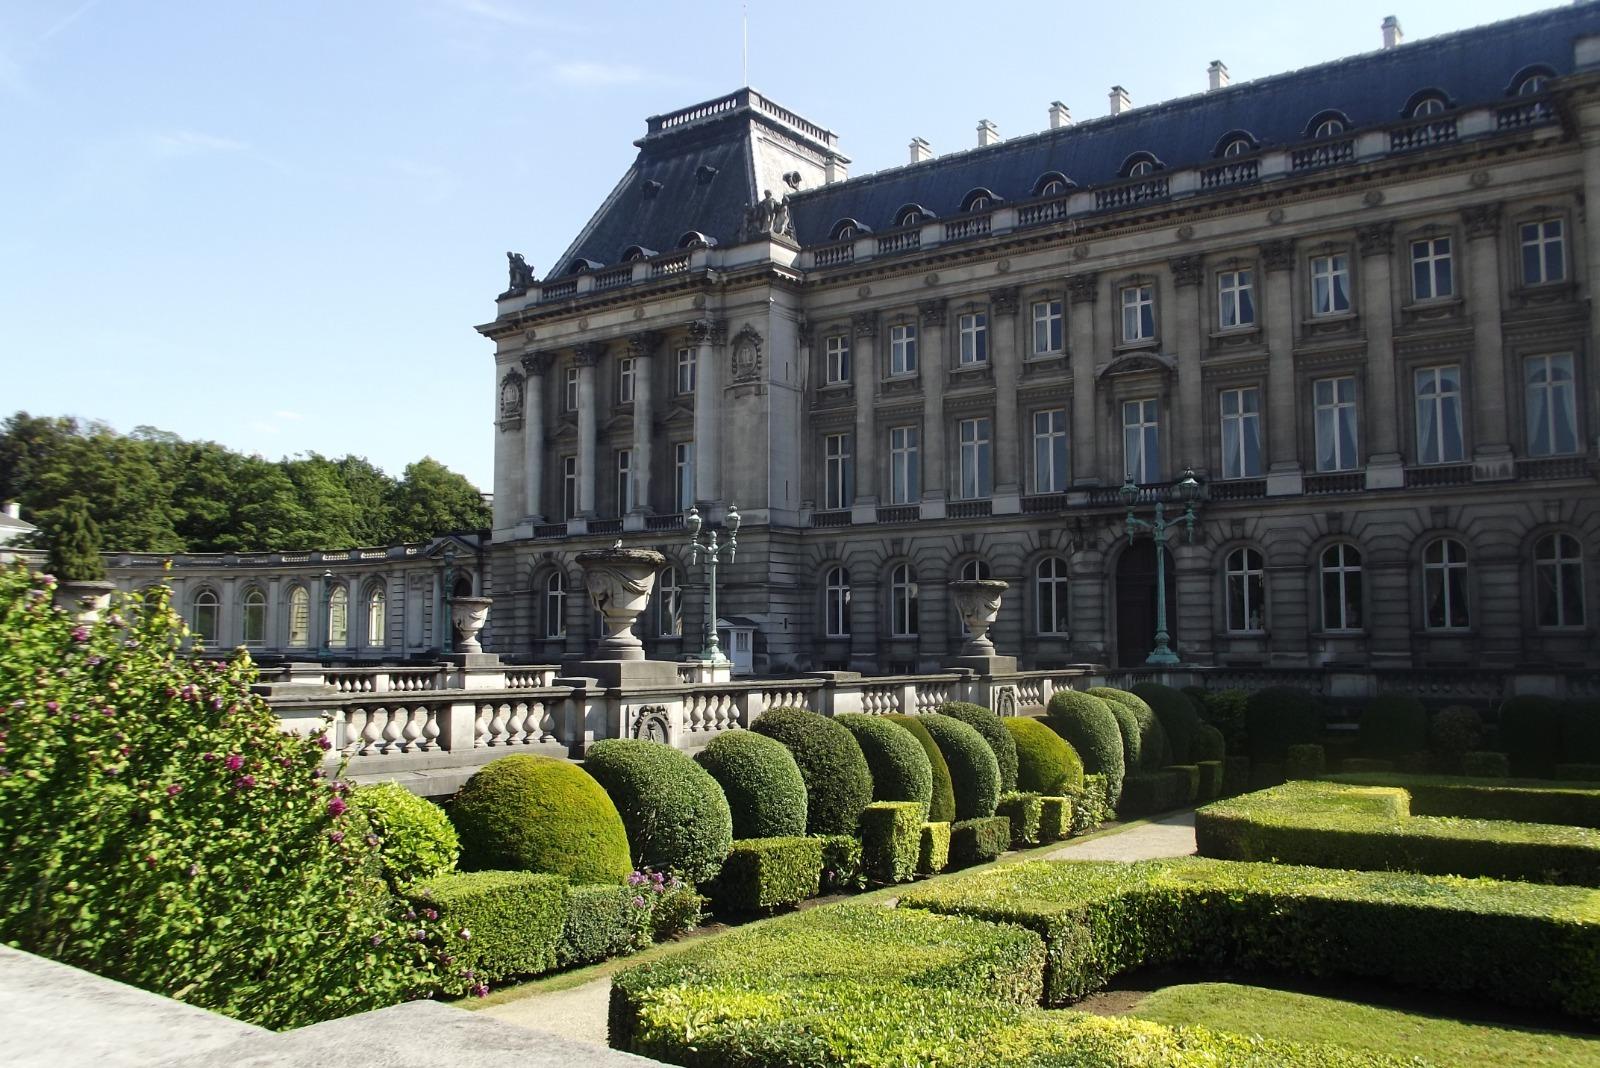 belgioelussemburgo17-1600418816.jpg